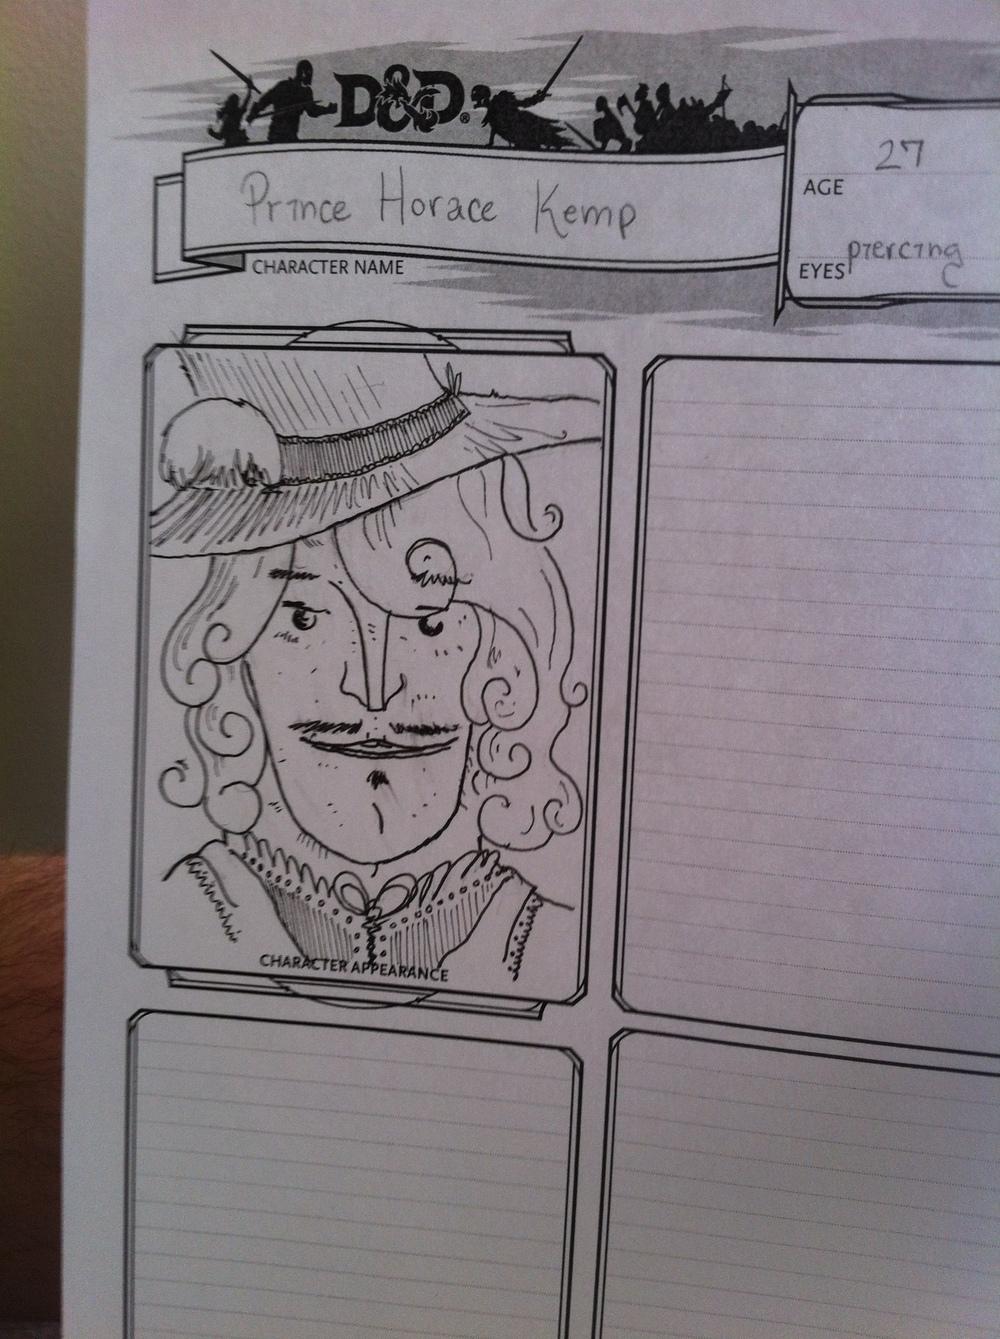 Prince Horace Kemp